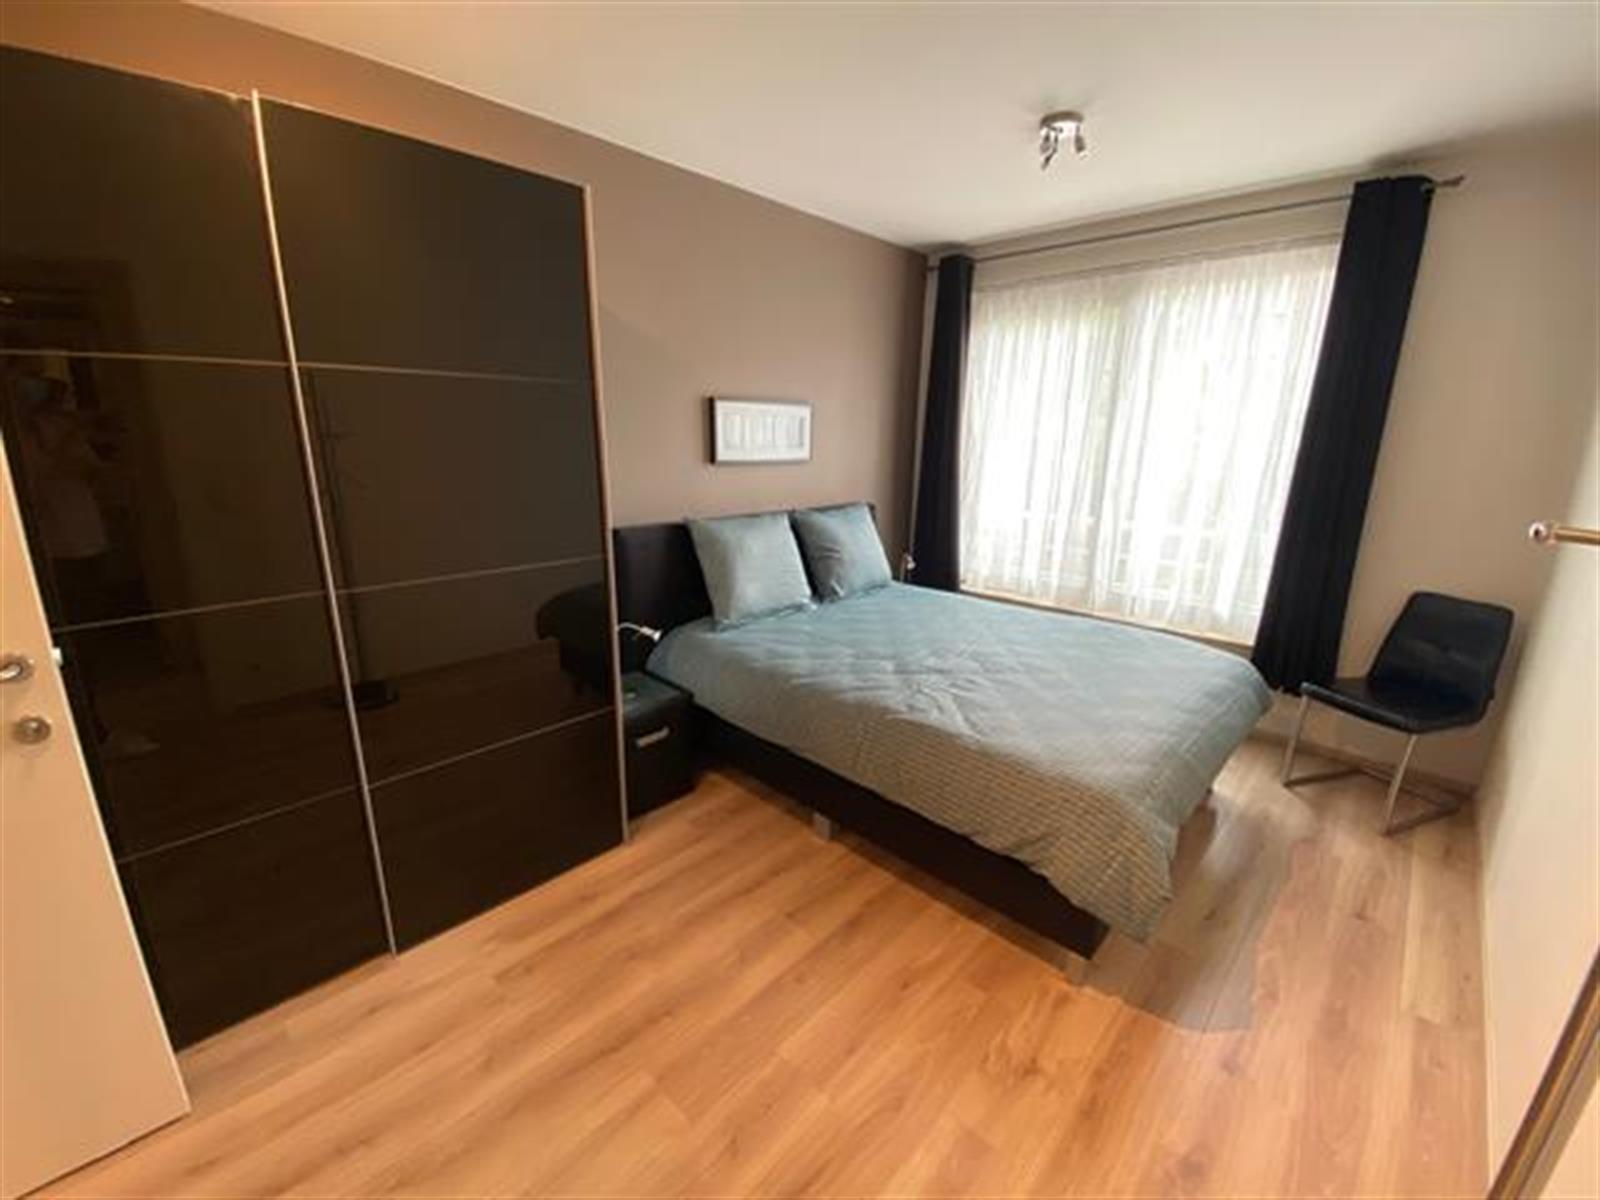 Flat - Etterbeek - #4074391-7